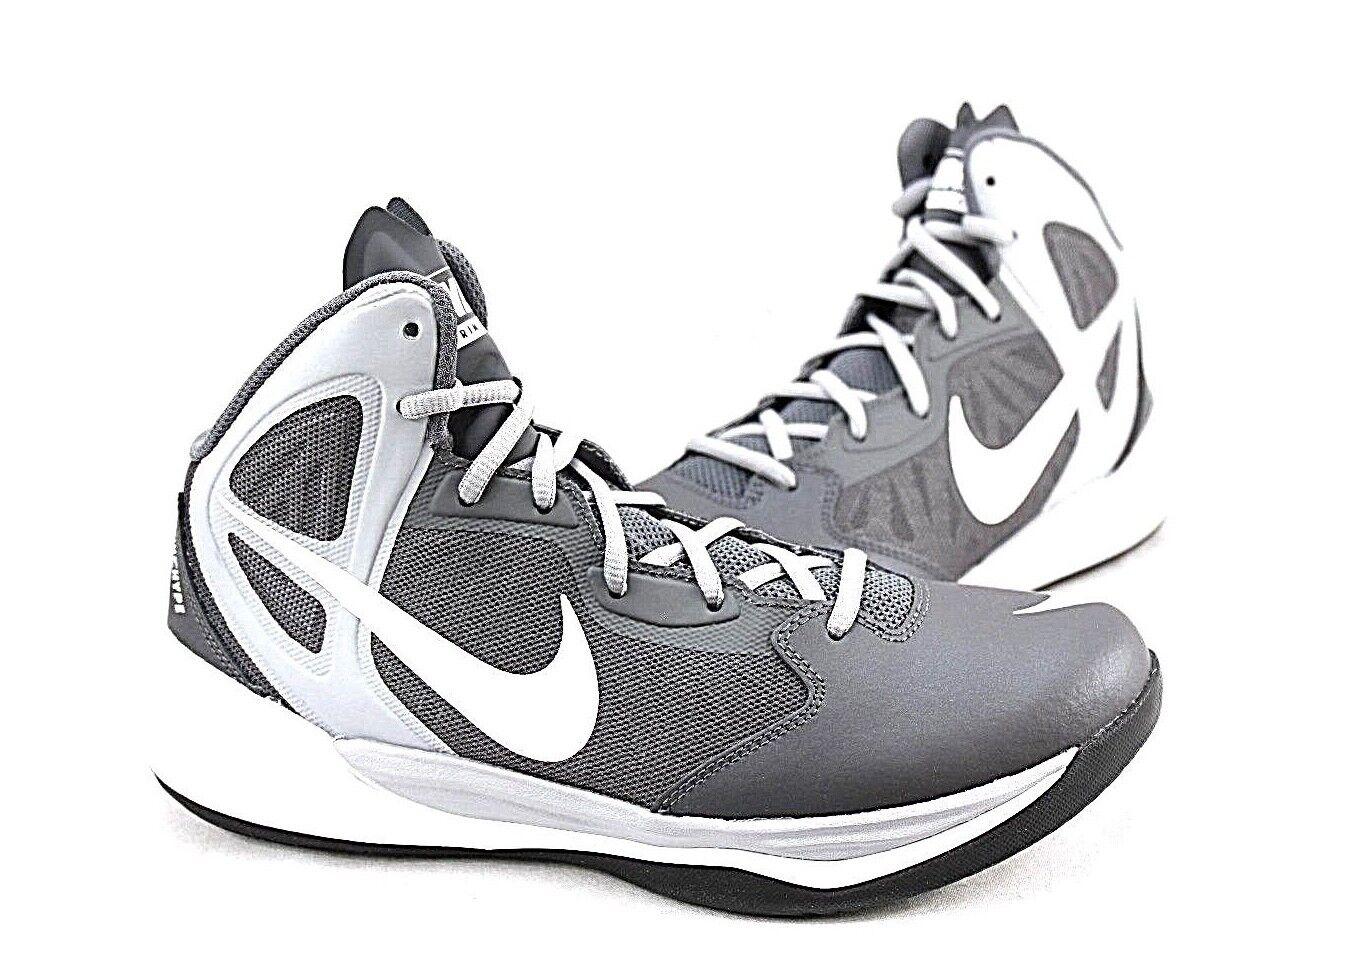 Nike primo hype df 683705-003 uomini sz: